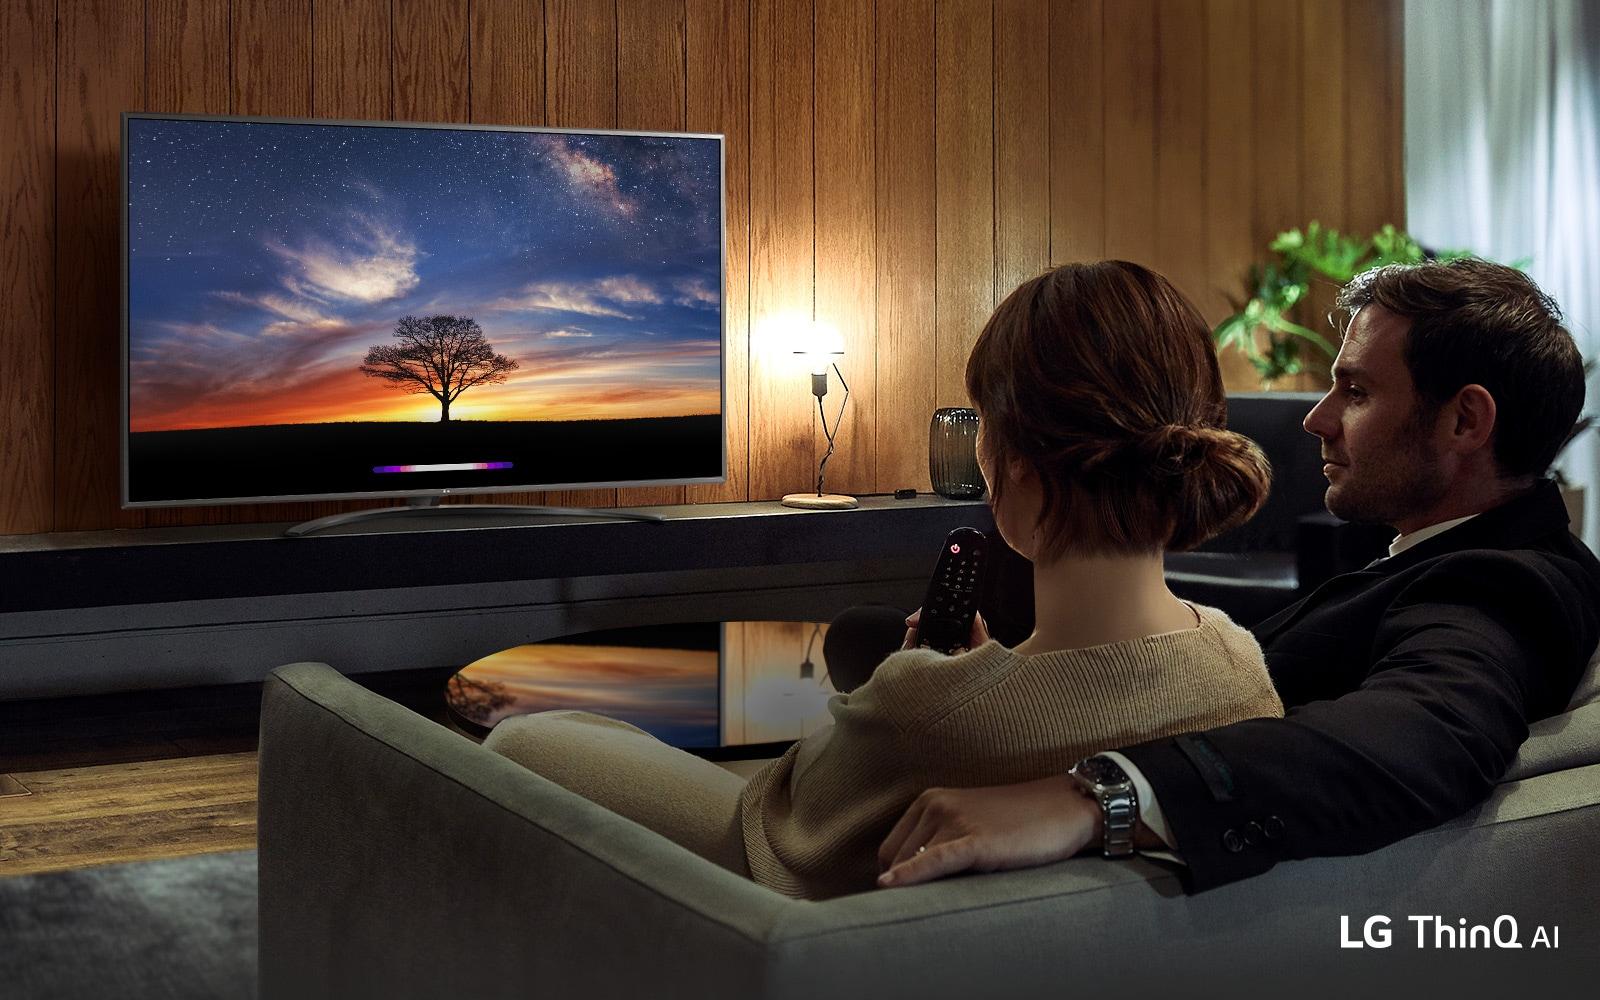 TV-UHD-UM74-01-AI-ThinQ-Desktop-17042019